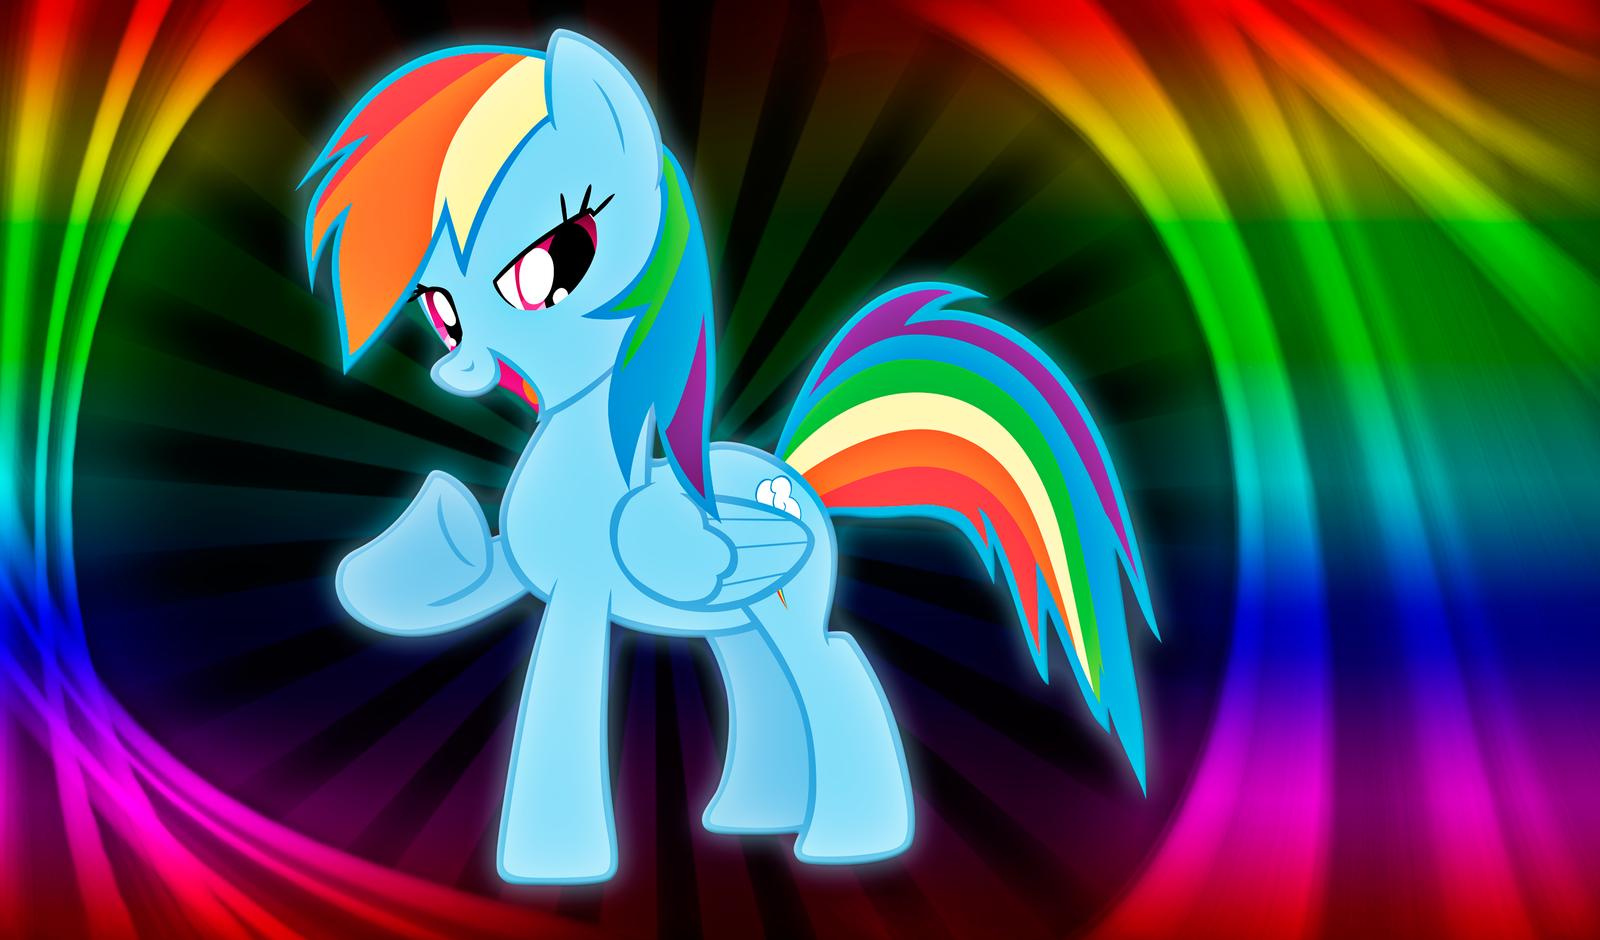 Rainbow Dash Wallpaper by alanfernandoflores01 on DeviantArt